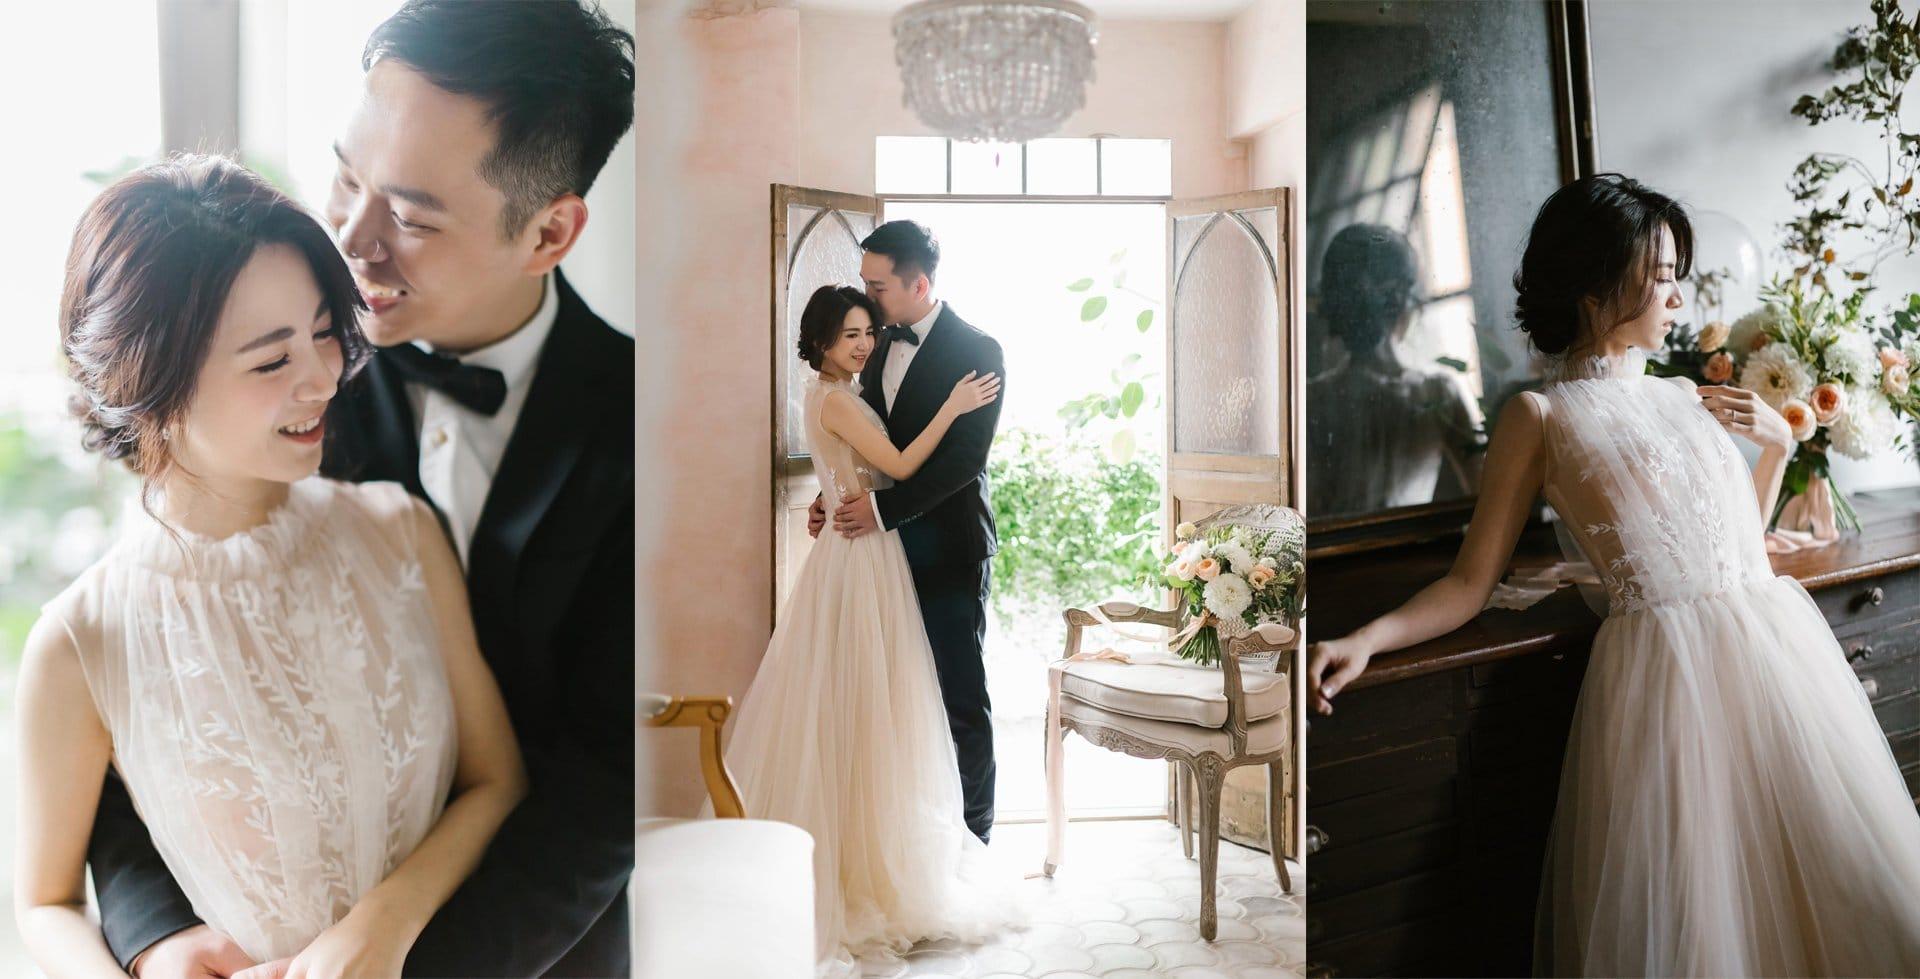 AG x 紅毯婚紗